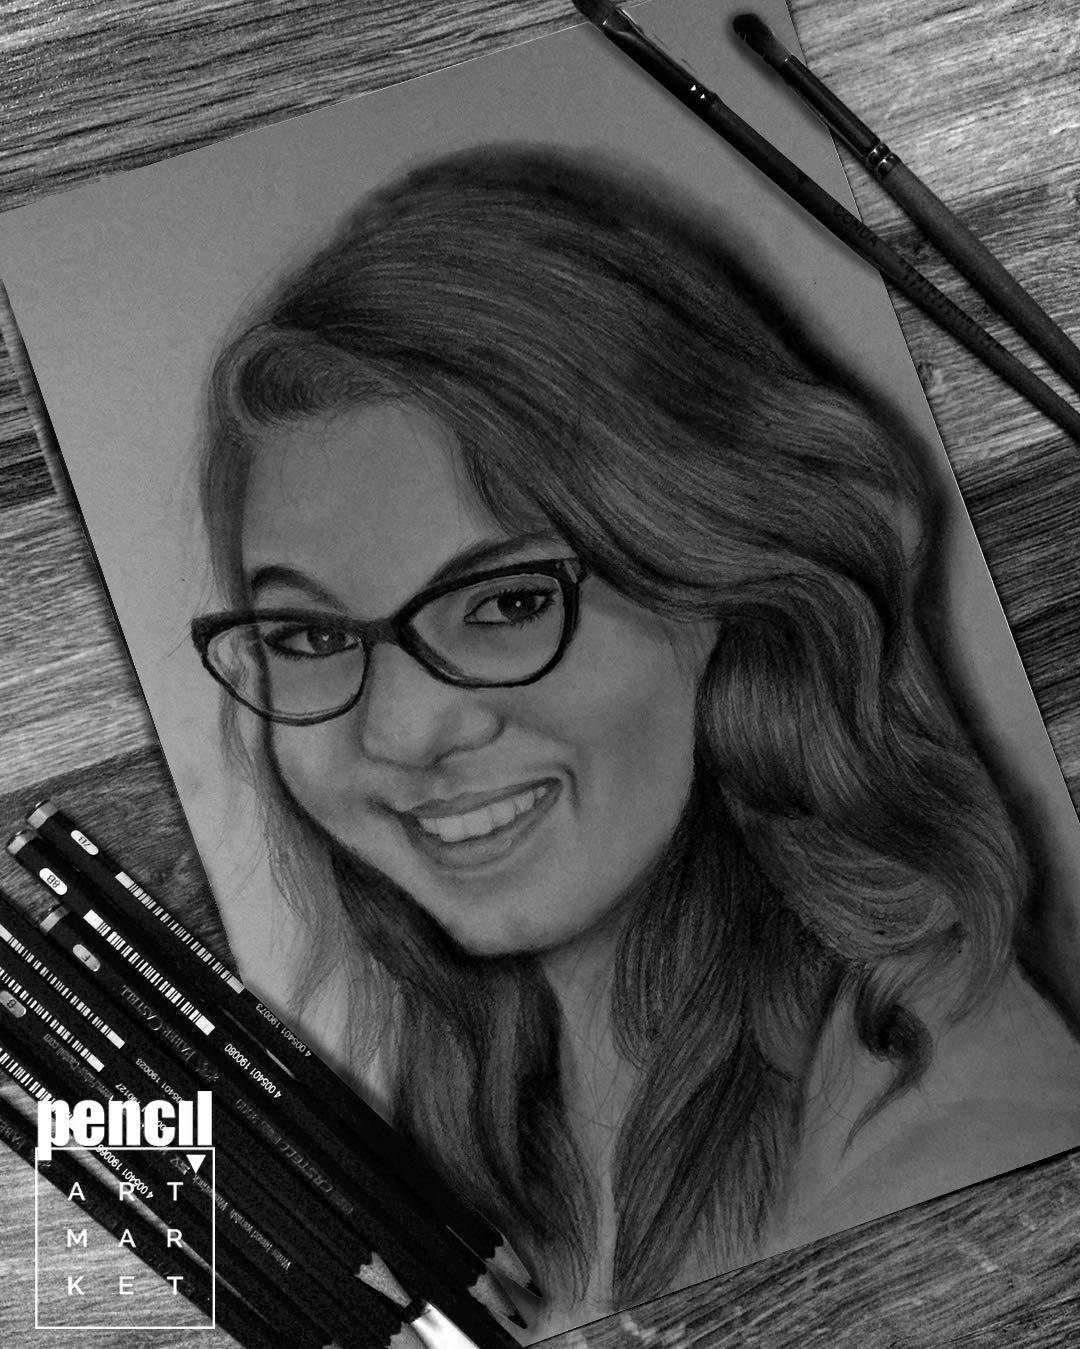 My magic gift pencil sketch portrait 12x18